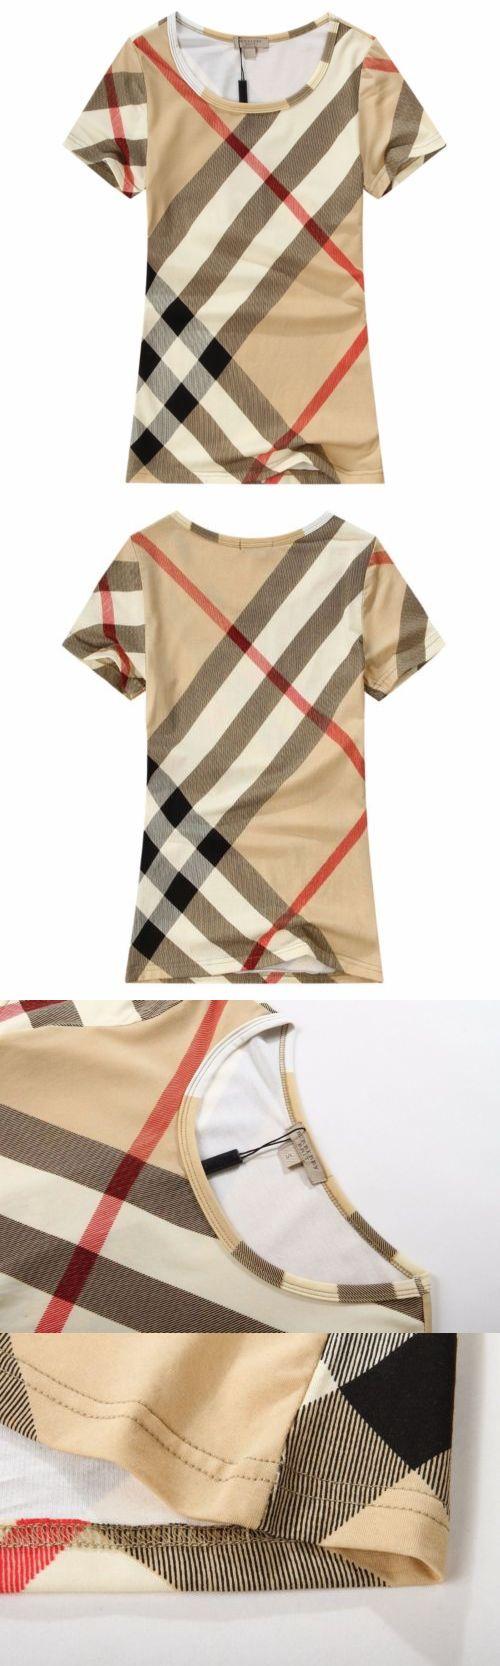 T-Shirts 63869: Burberry Classic Fashion Desgin Brown Women Short Sleeve T-Shirts S M L Xl Xxl -> BUY IT NOW ONLY: $99.99 on eBay!